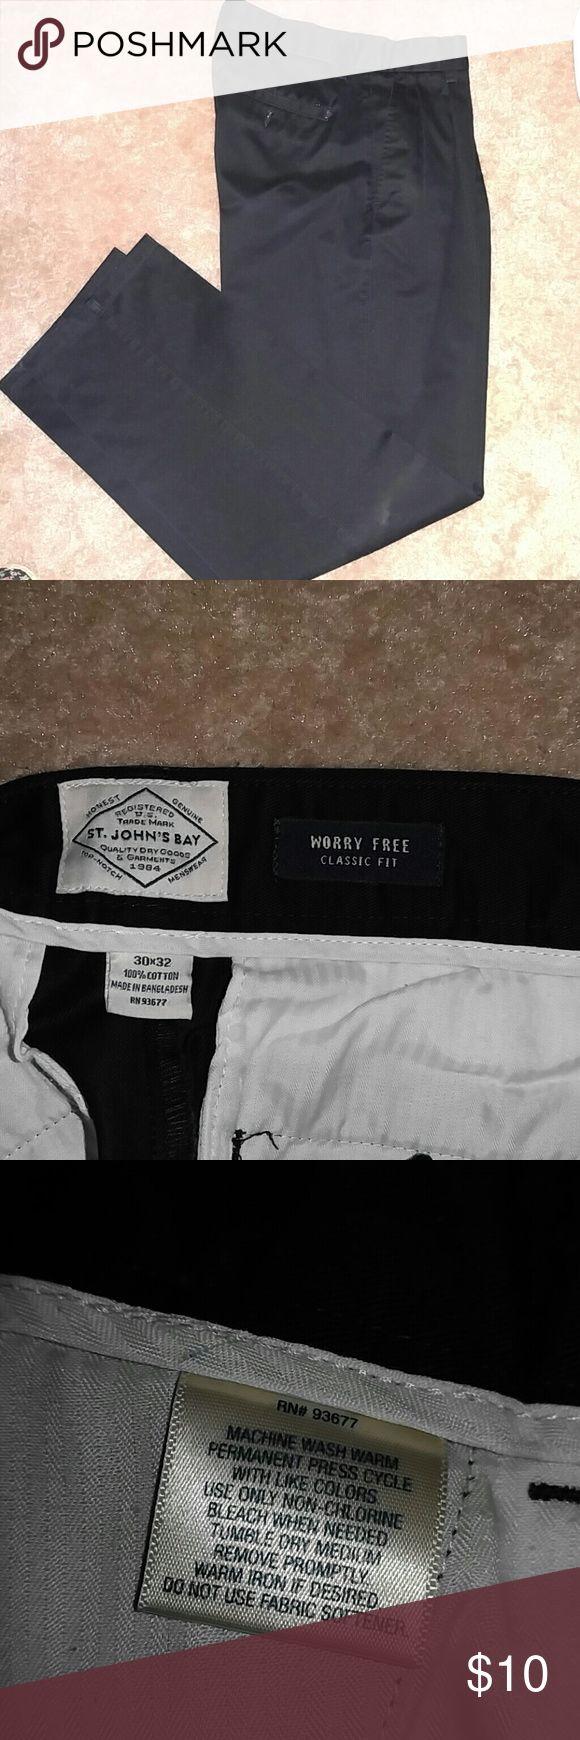 Mens slacks Size 30X32 Pants Dress